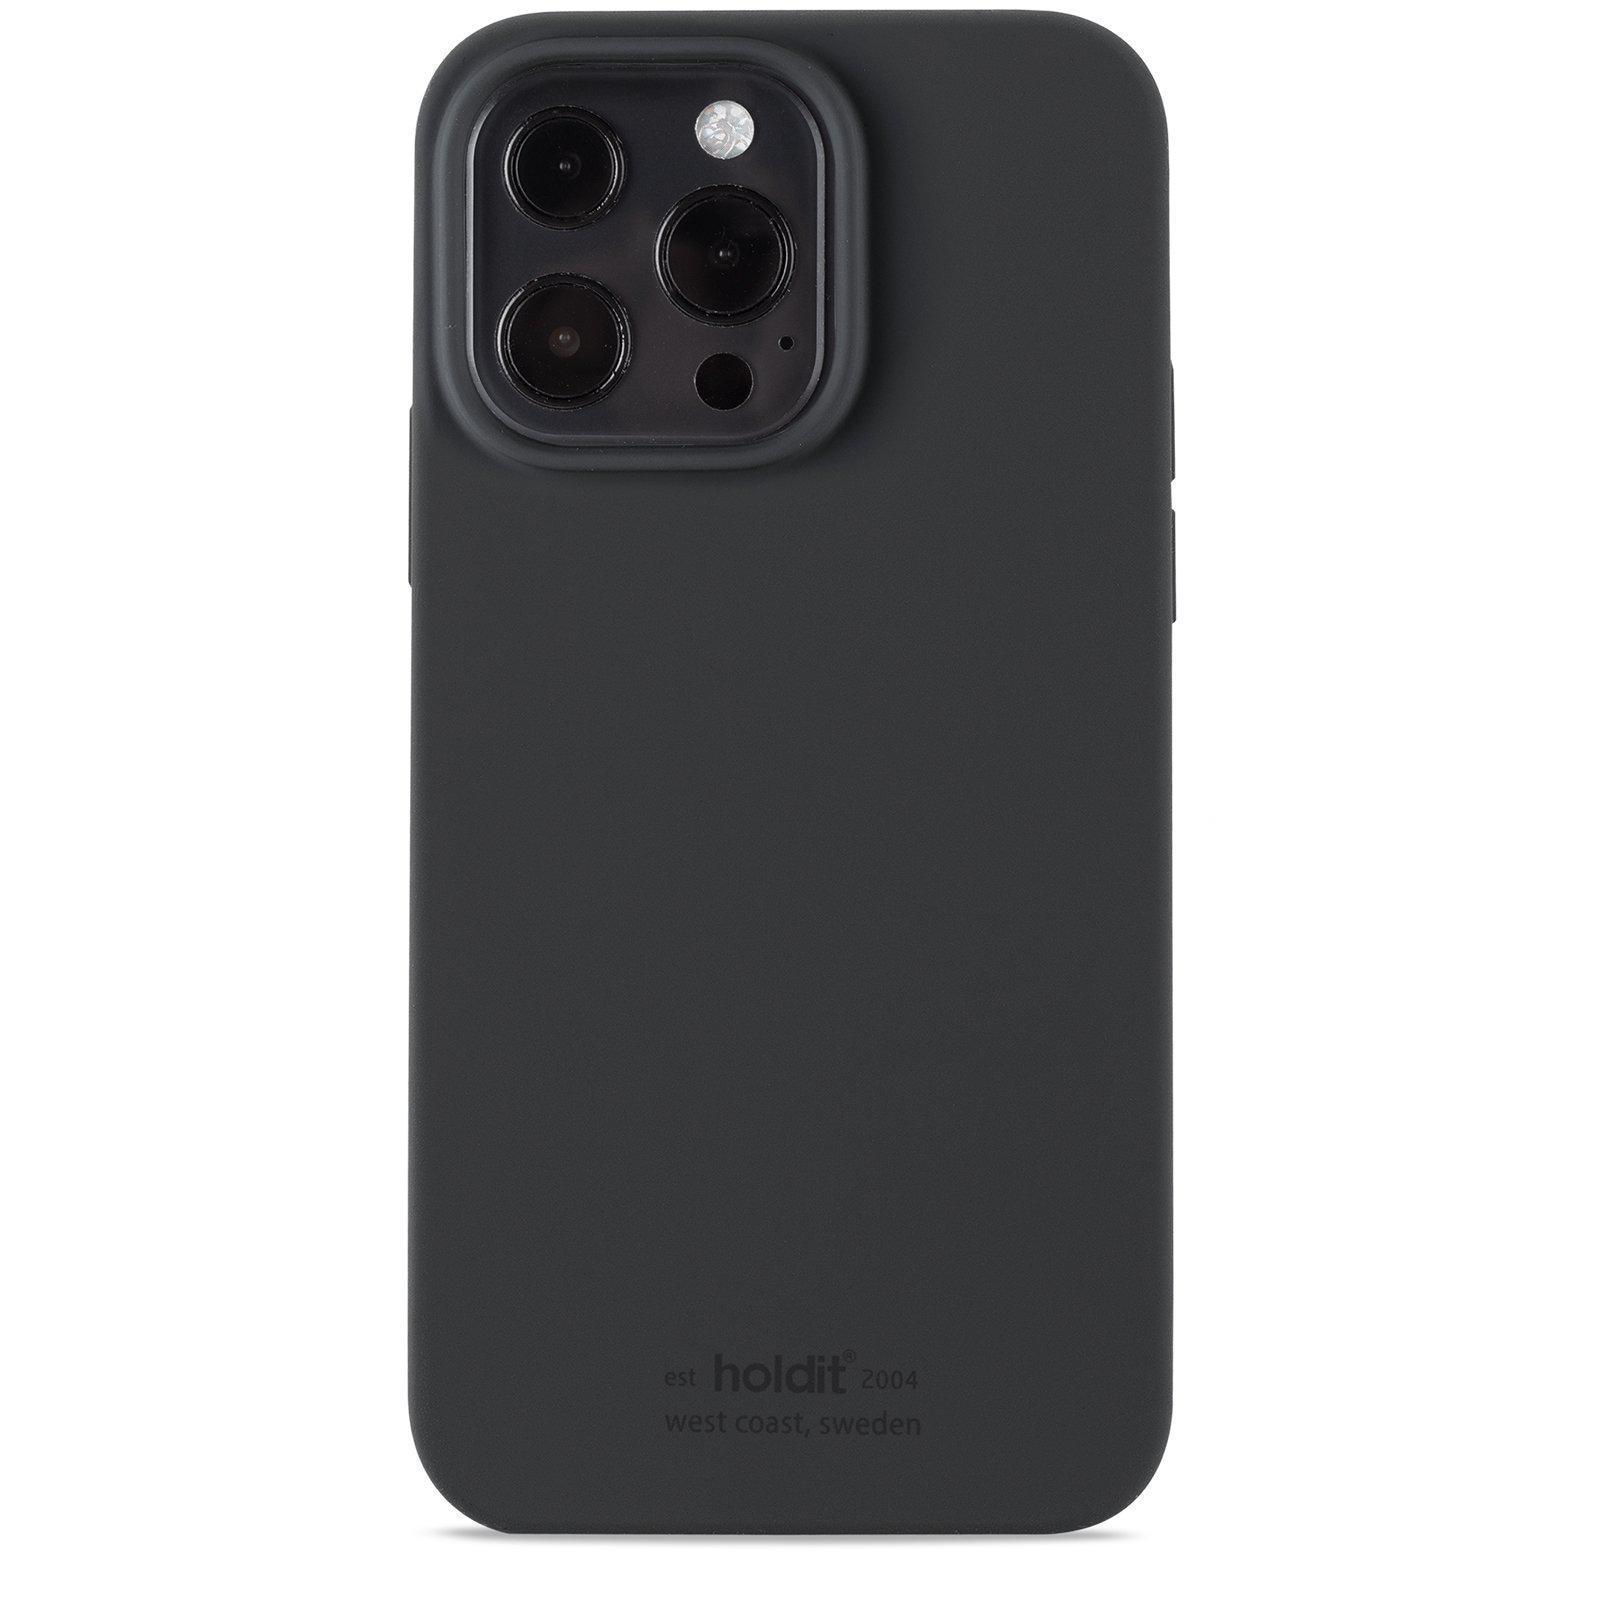 Silikonikuori iPhone 13 Pro Max Black